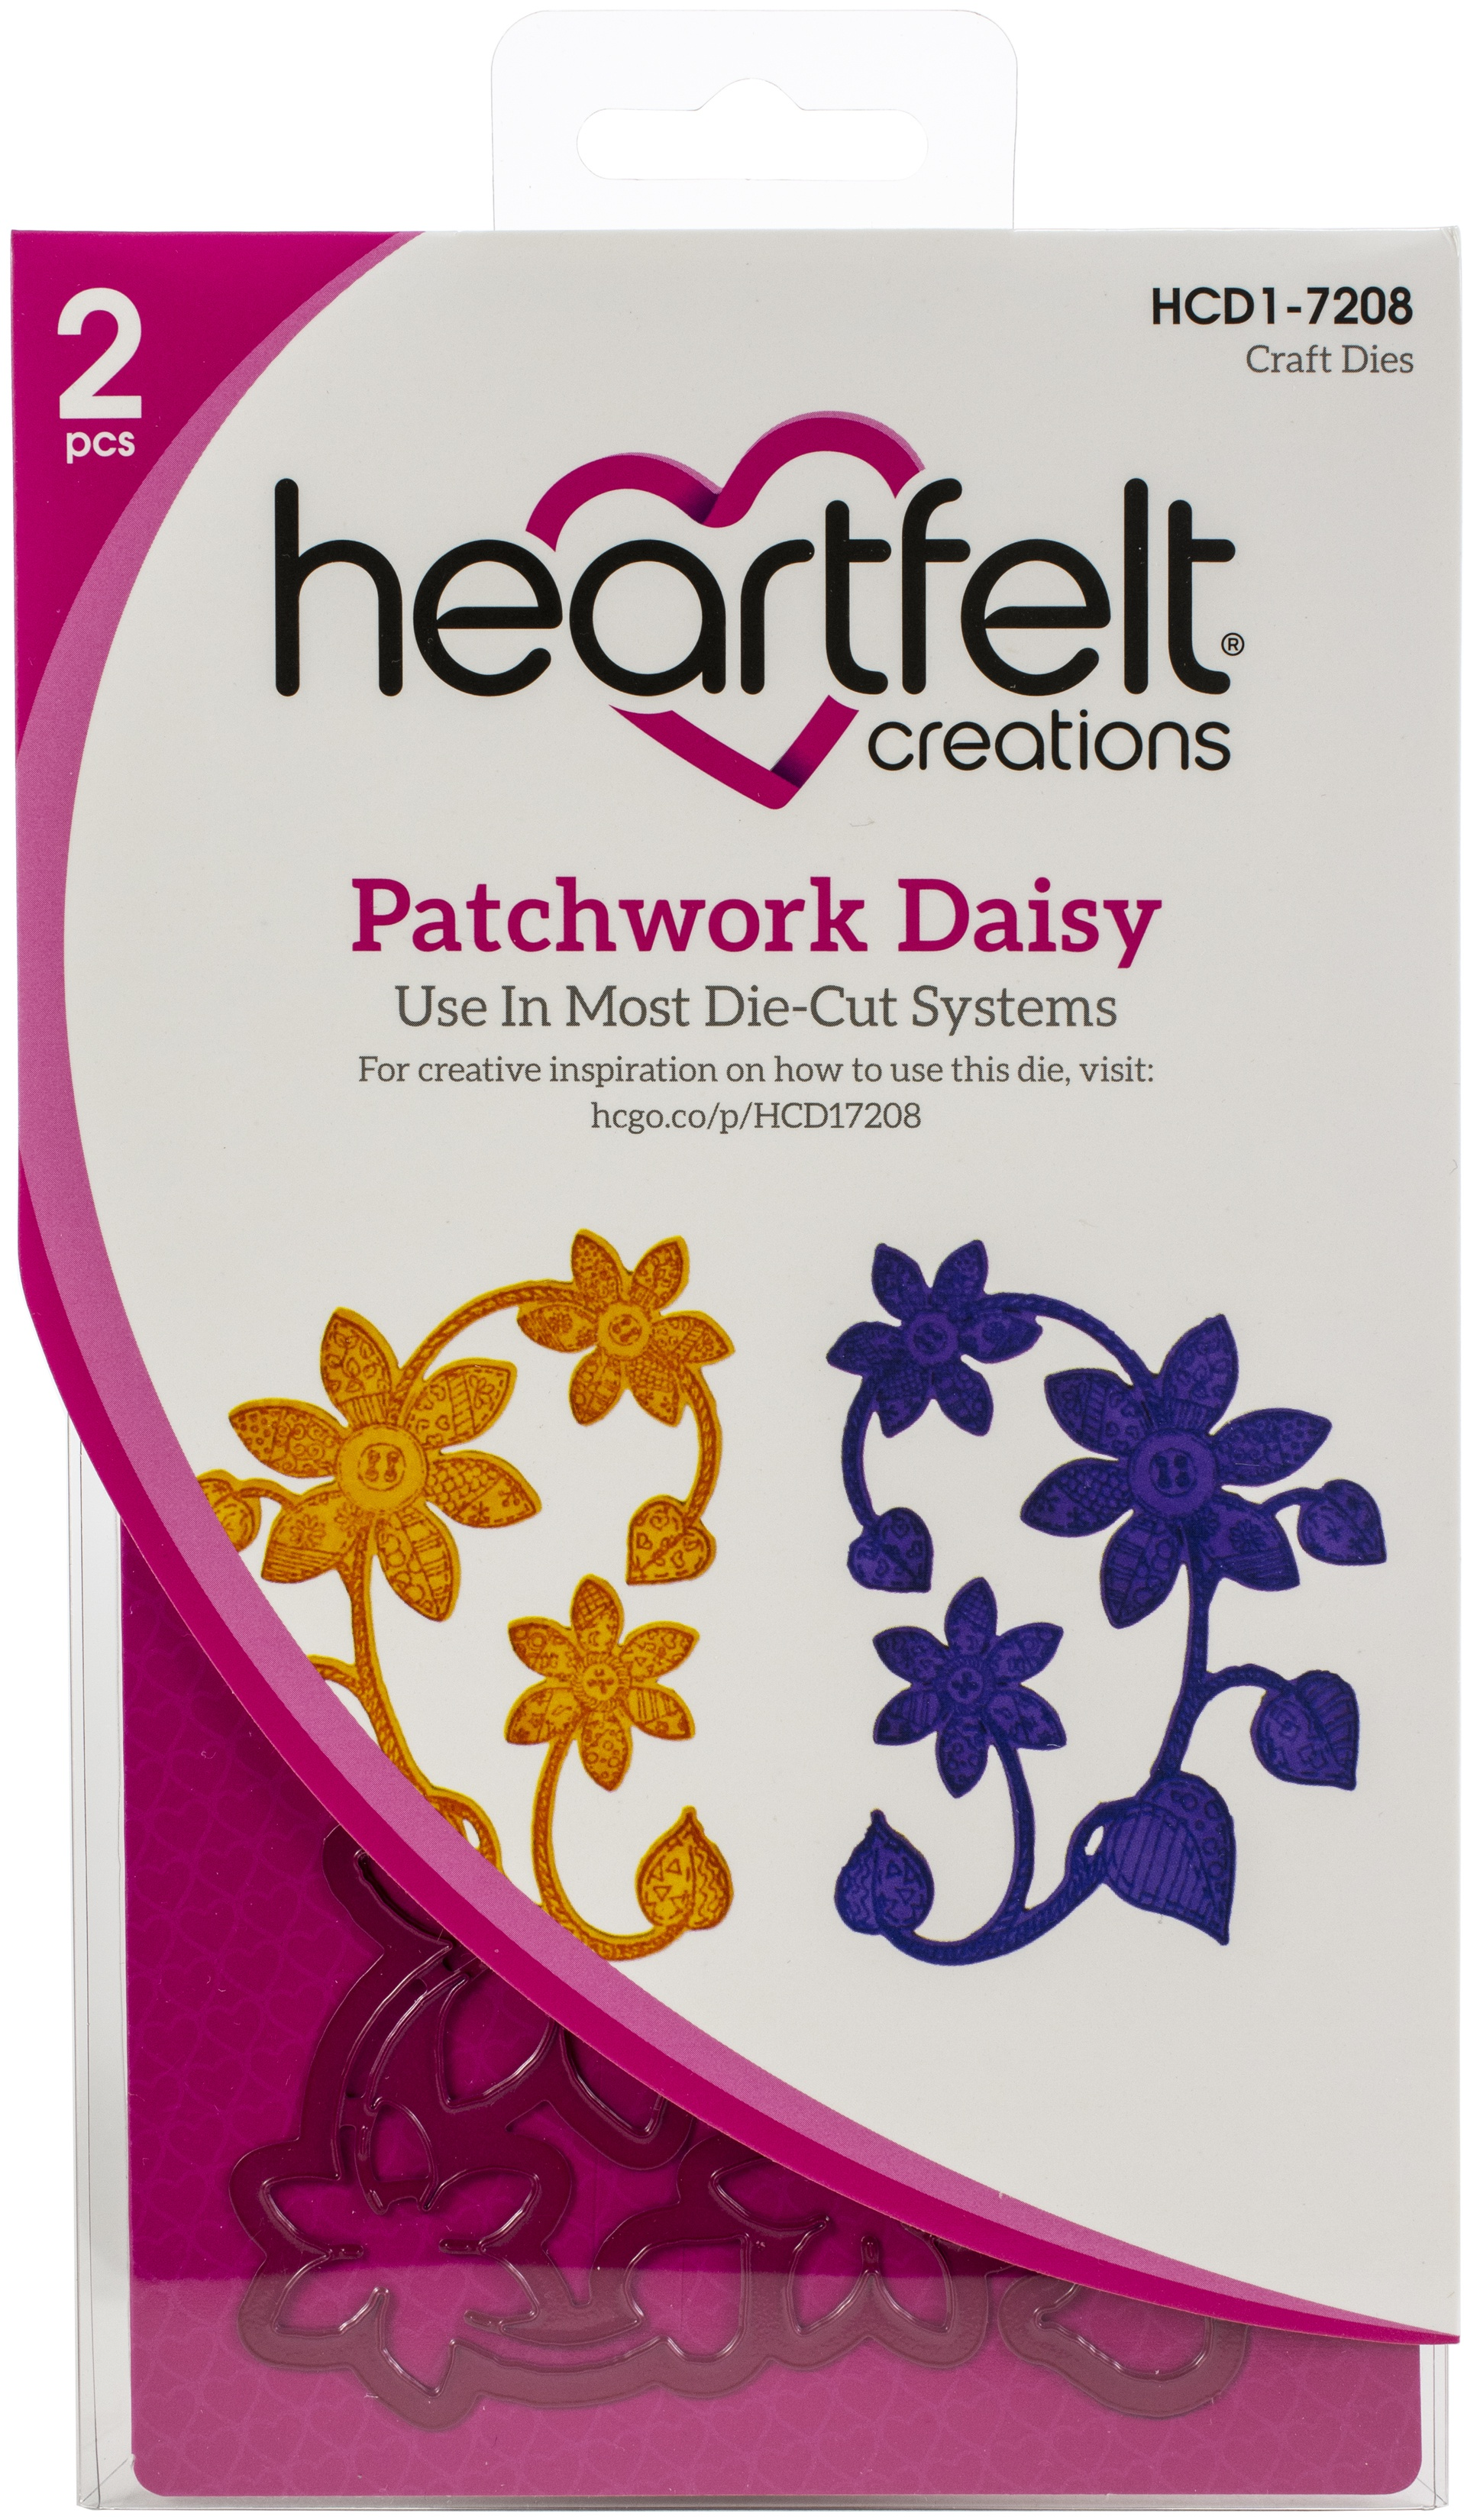 Heartfelt Creations Spellbinders Die ~ PATCHWORK DAISY ~ HCD1-7208